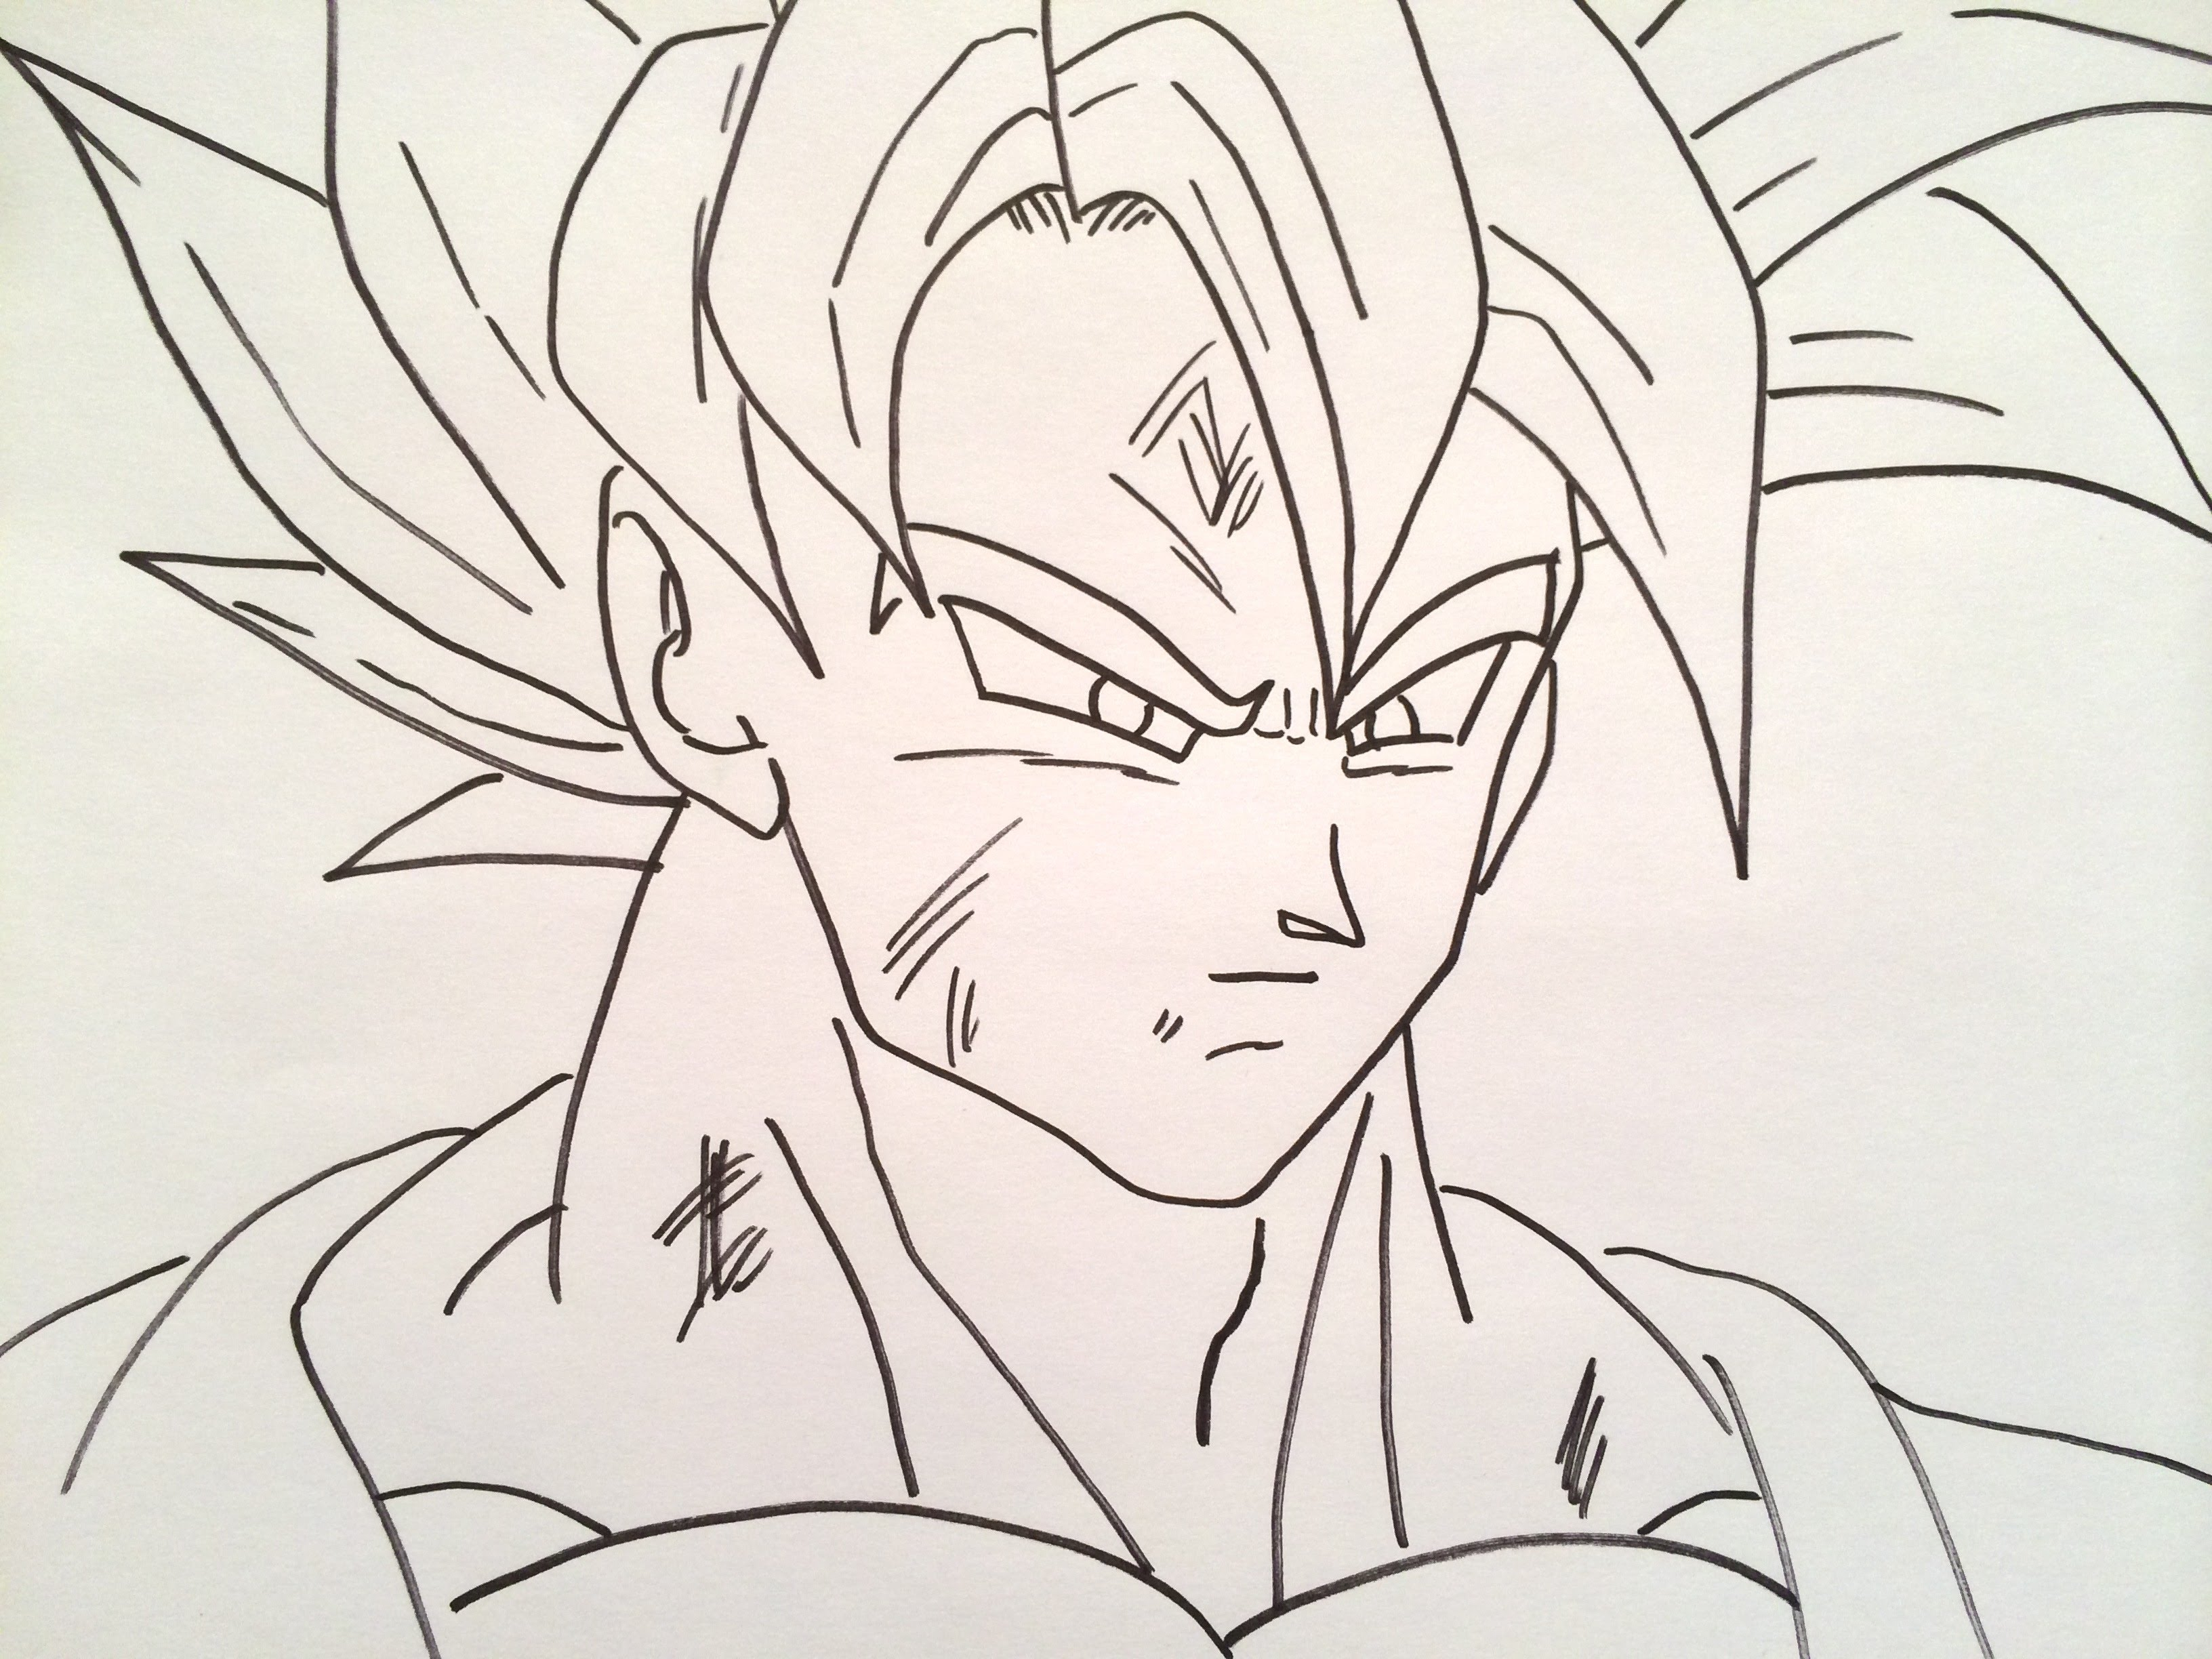 3264x2448 How To Draw Goku Super Saiyan